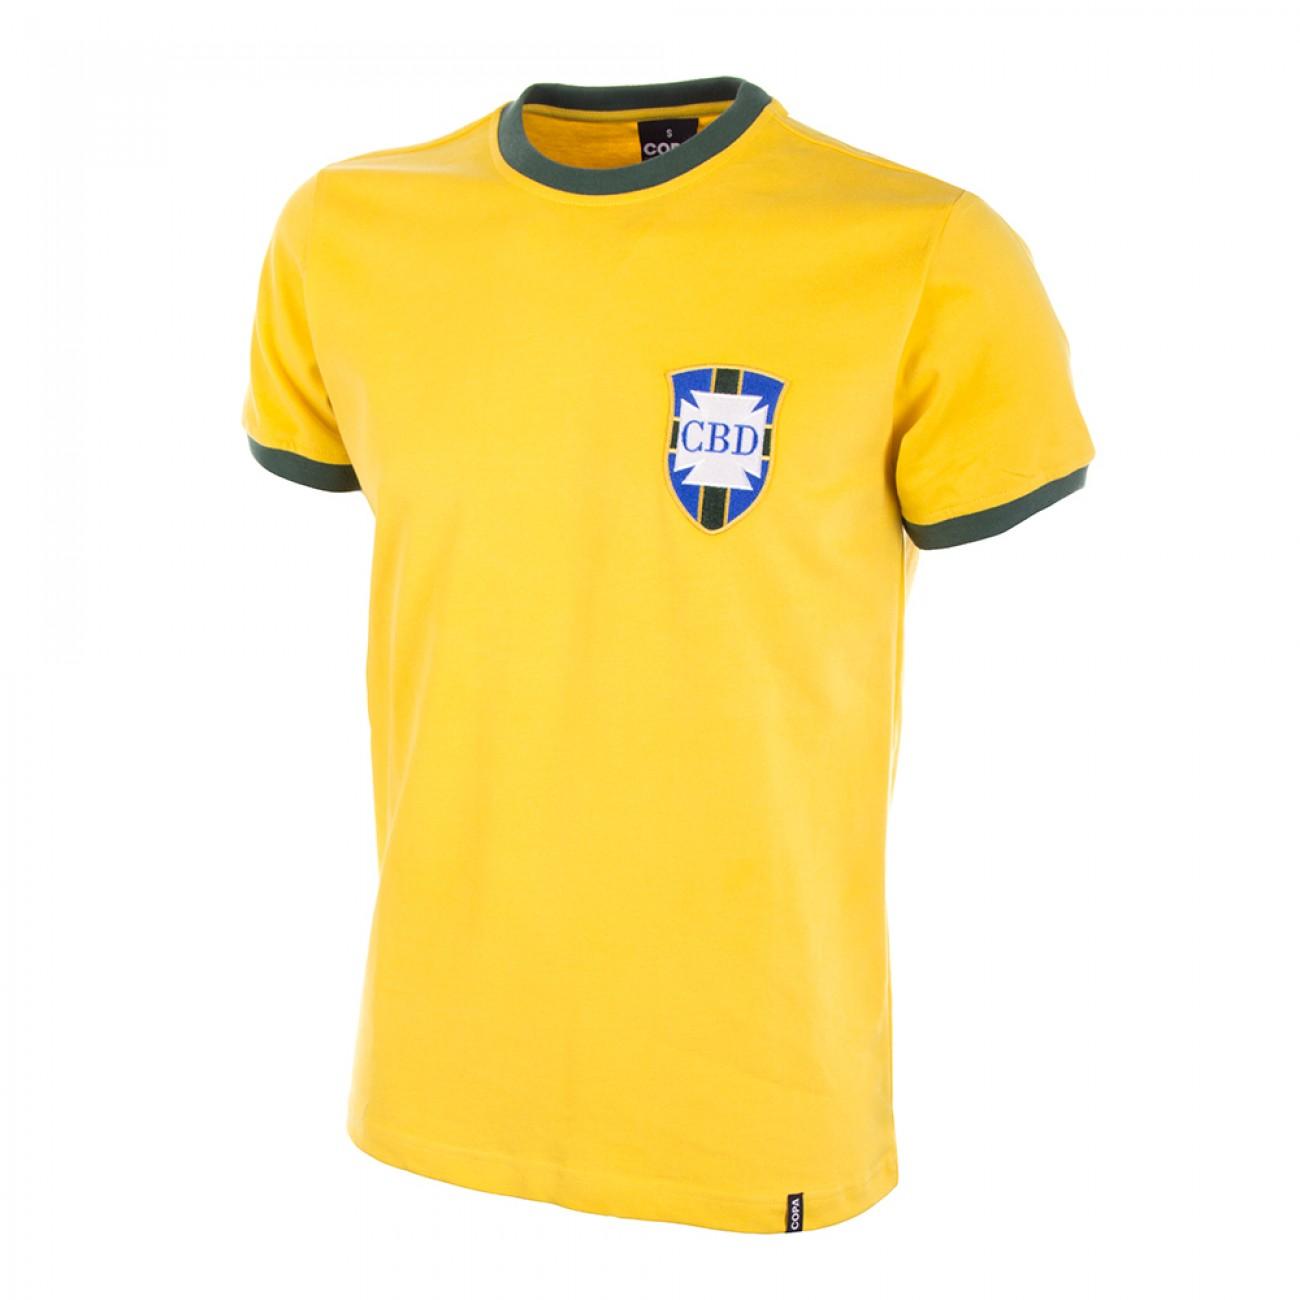 http://www.retrofootball.es/ropa-de-futbol/camiseta-brasil-mundial-1970.html